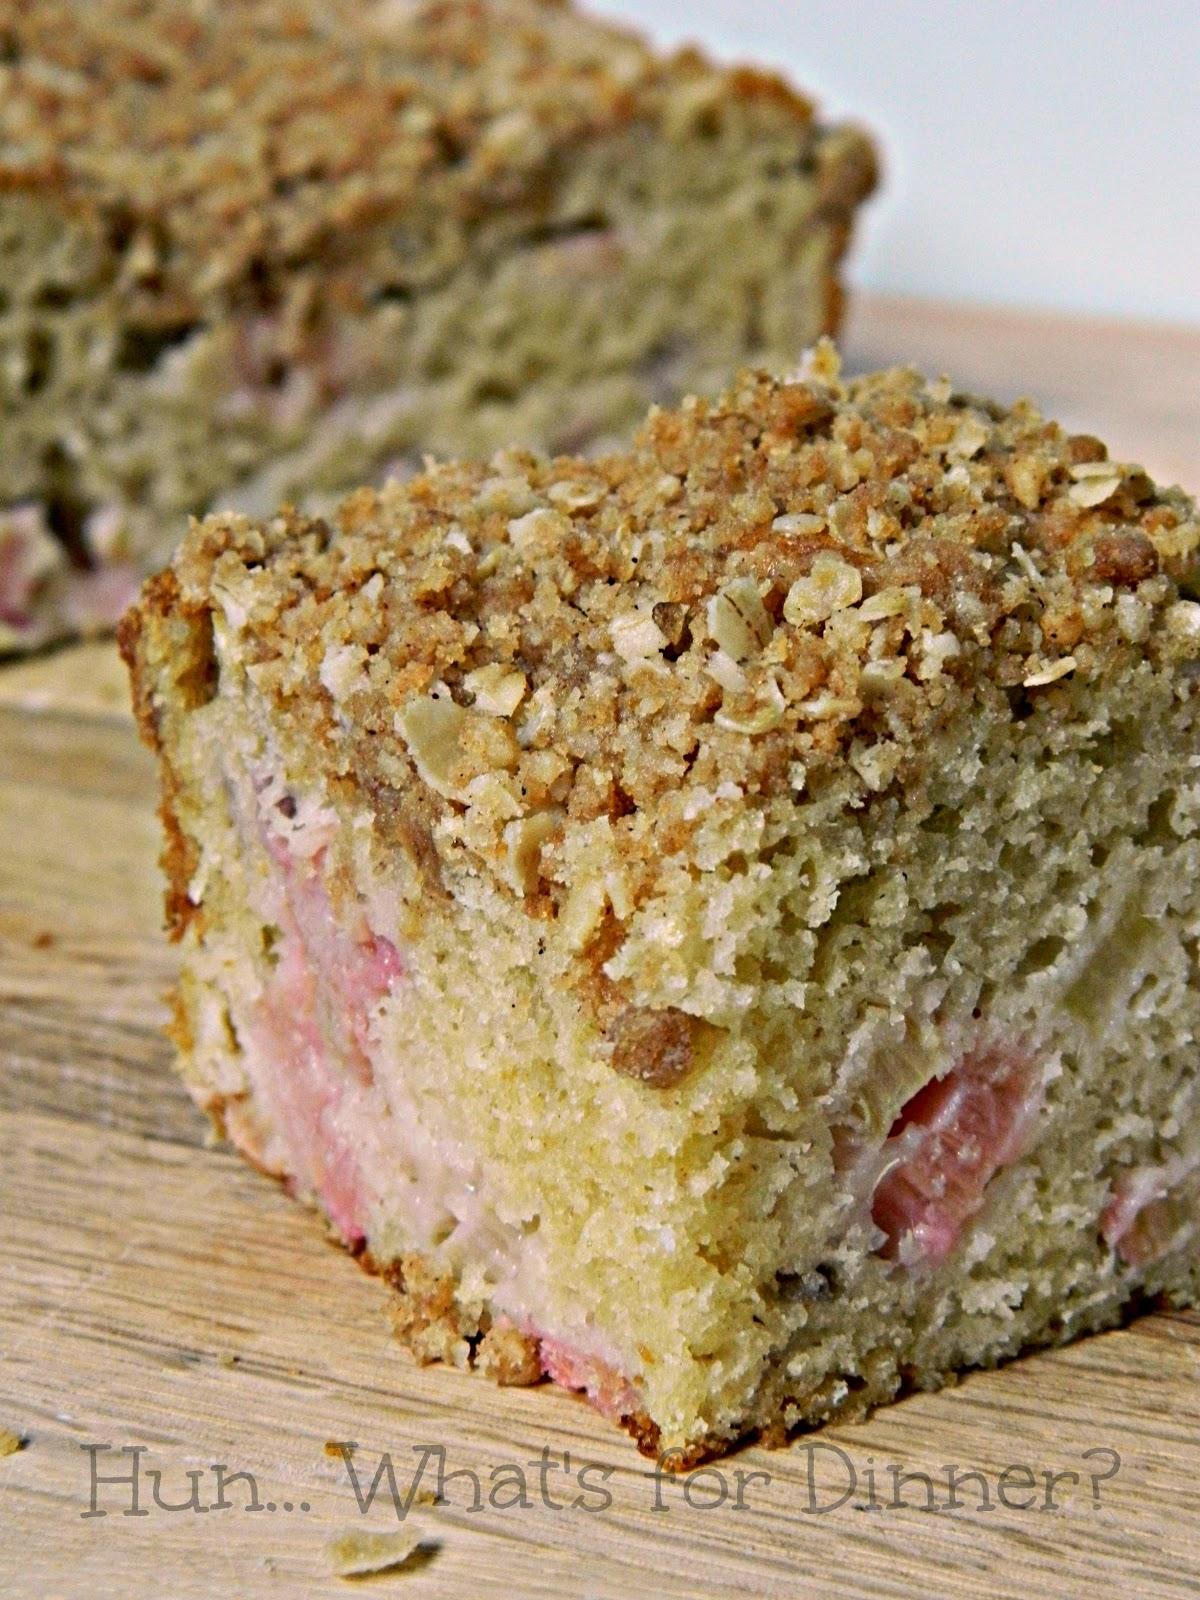 Hun... What's for Dinner? | Rhubarb Coffee Cake